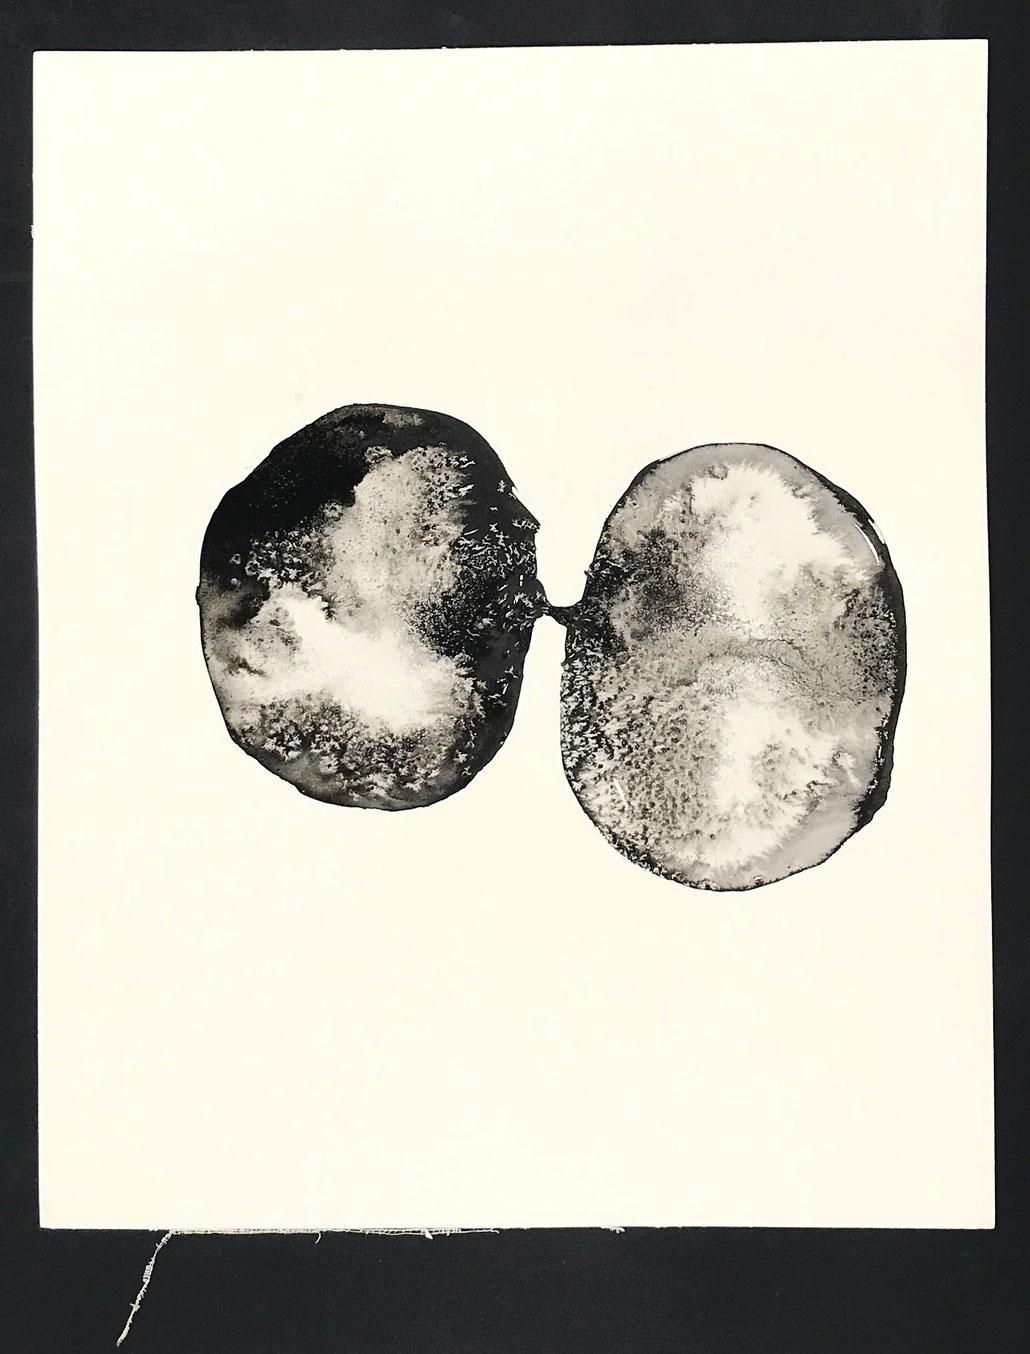 Thean Chie Chan Kunst / artwork